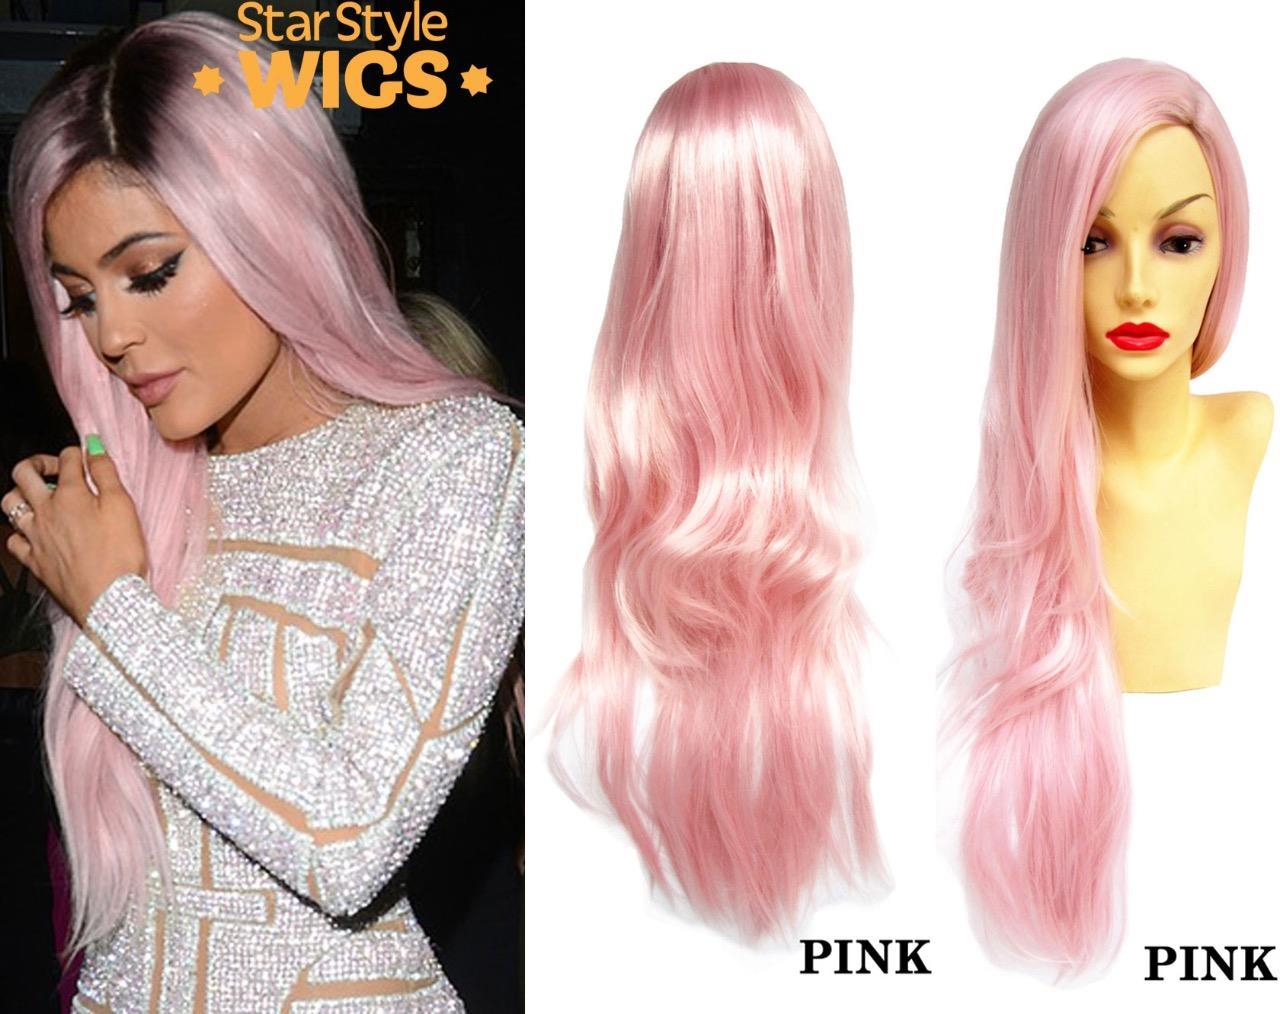 Kylie-Jenner-largo-pastel-resistente-al-calor-Pelucas-De-Moda-Verde-Rosa-Purpura-Plata